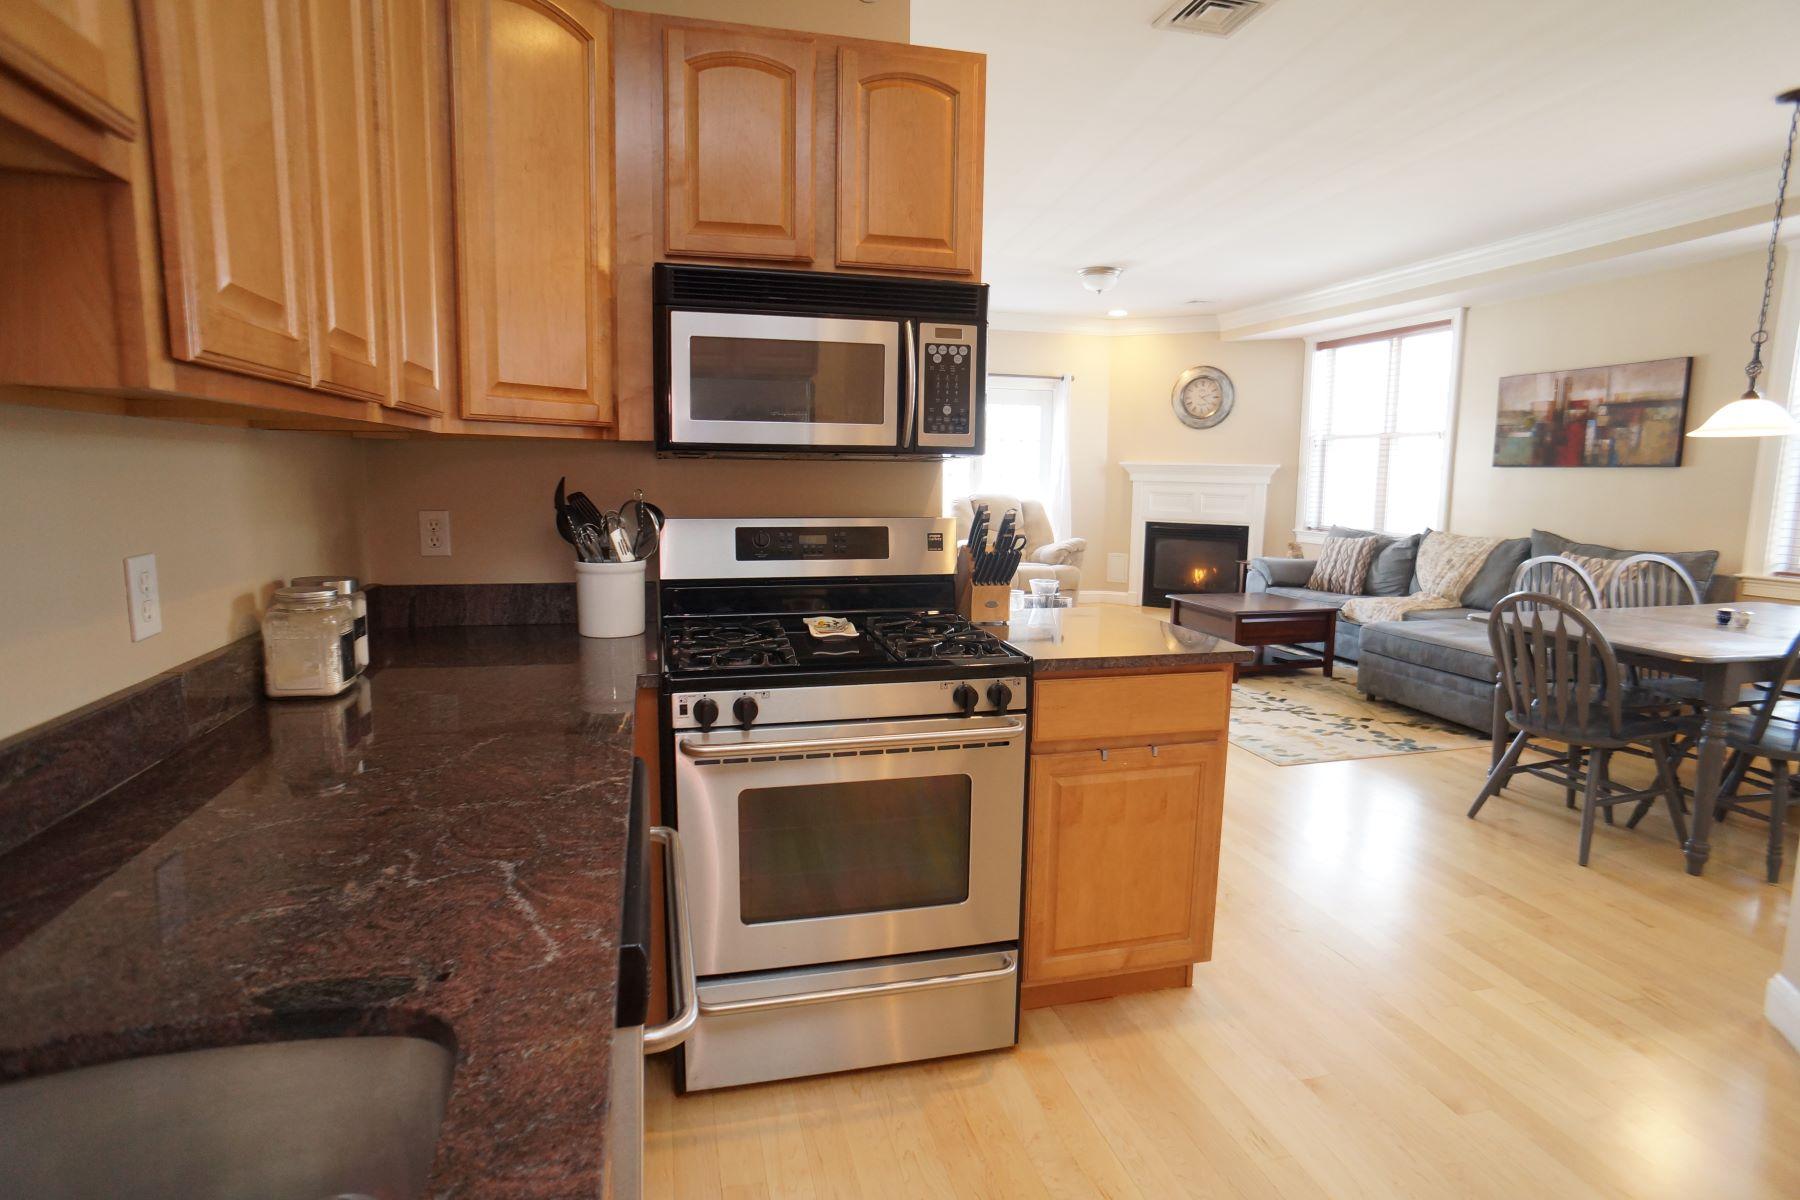 Condominio per Vendita alle ore 8 Howell St. 3, Boston 8 Howell St #3 Boston, Massachusetts, 02125 Stati Uniti